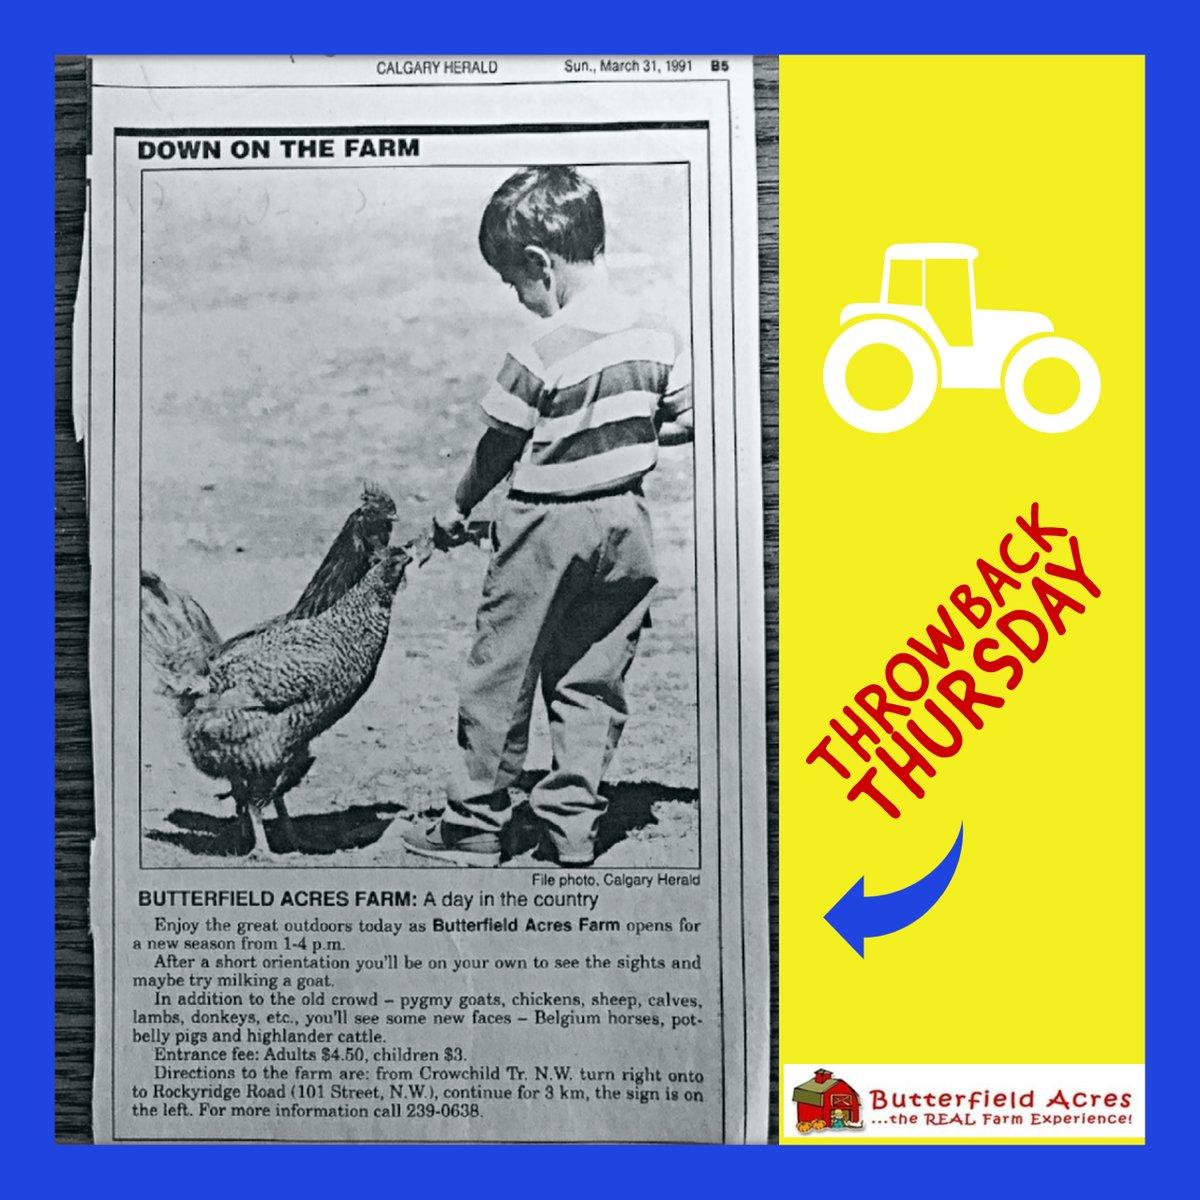 Kicking it back to March 31,1991🙌😎!  #ThrowbackThursday #TBT #YYC #Calgary #farmfun #oldschool